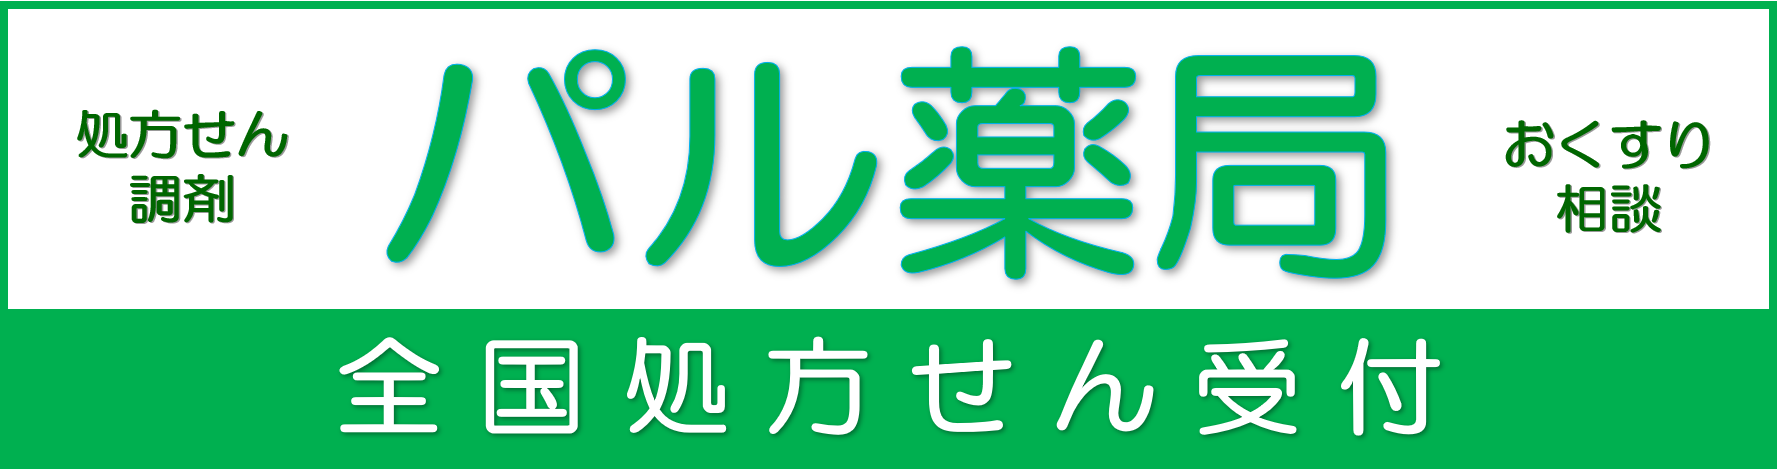 banner_pal